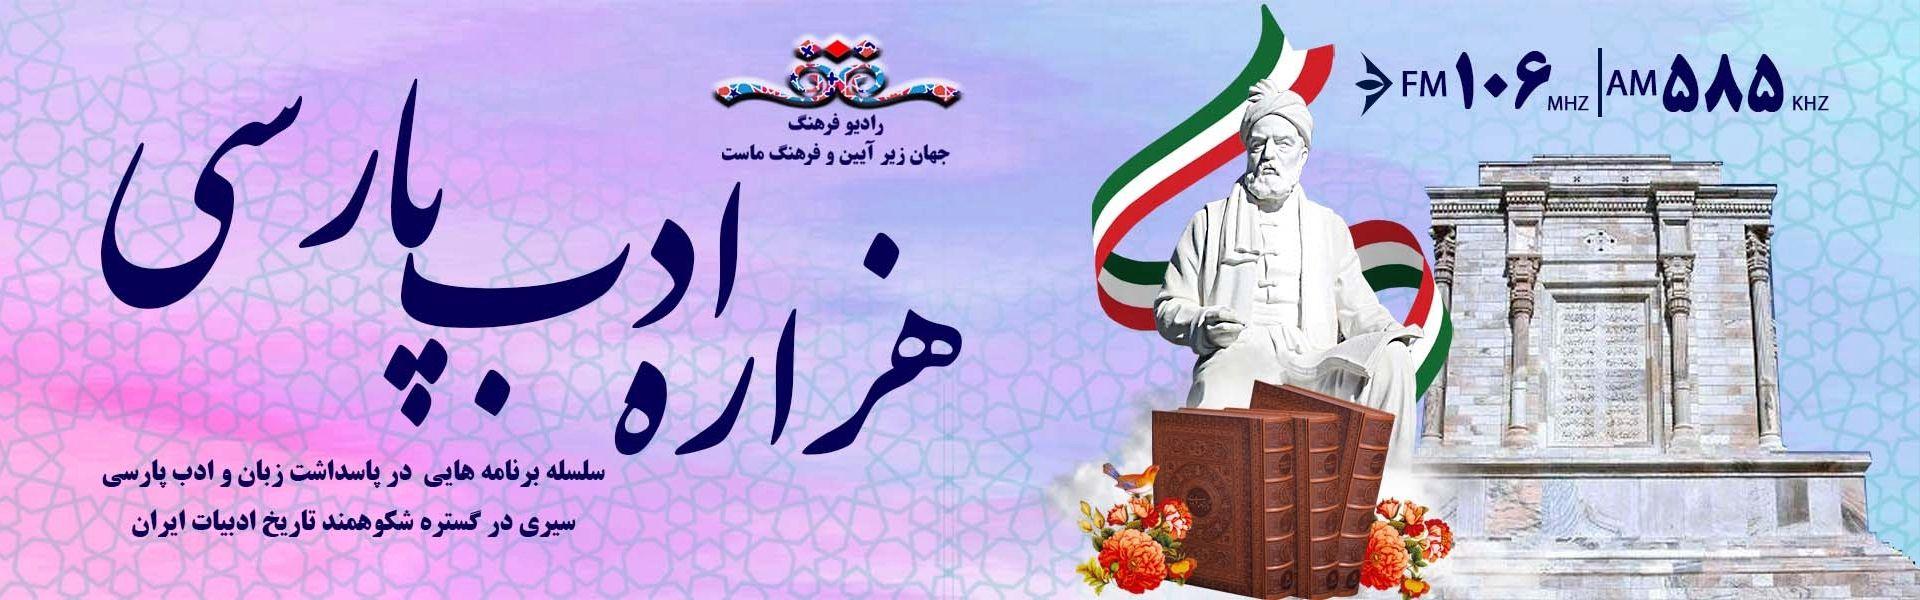 هزاره ادب فارسی